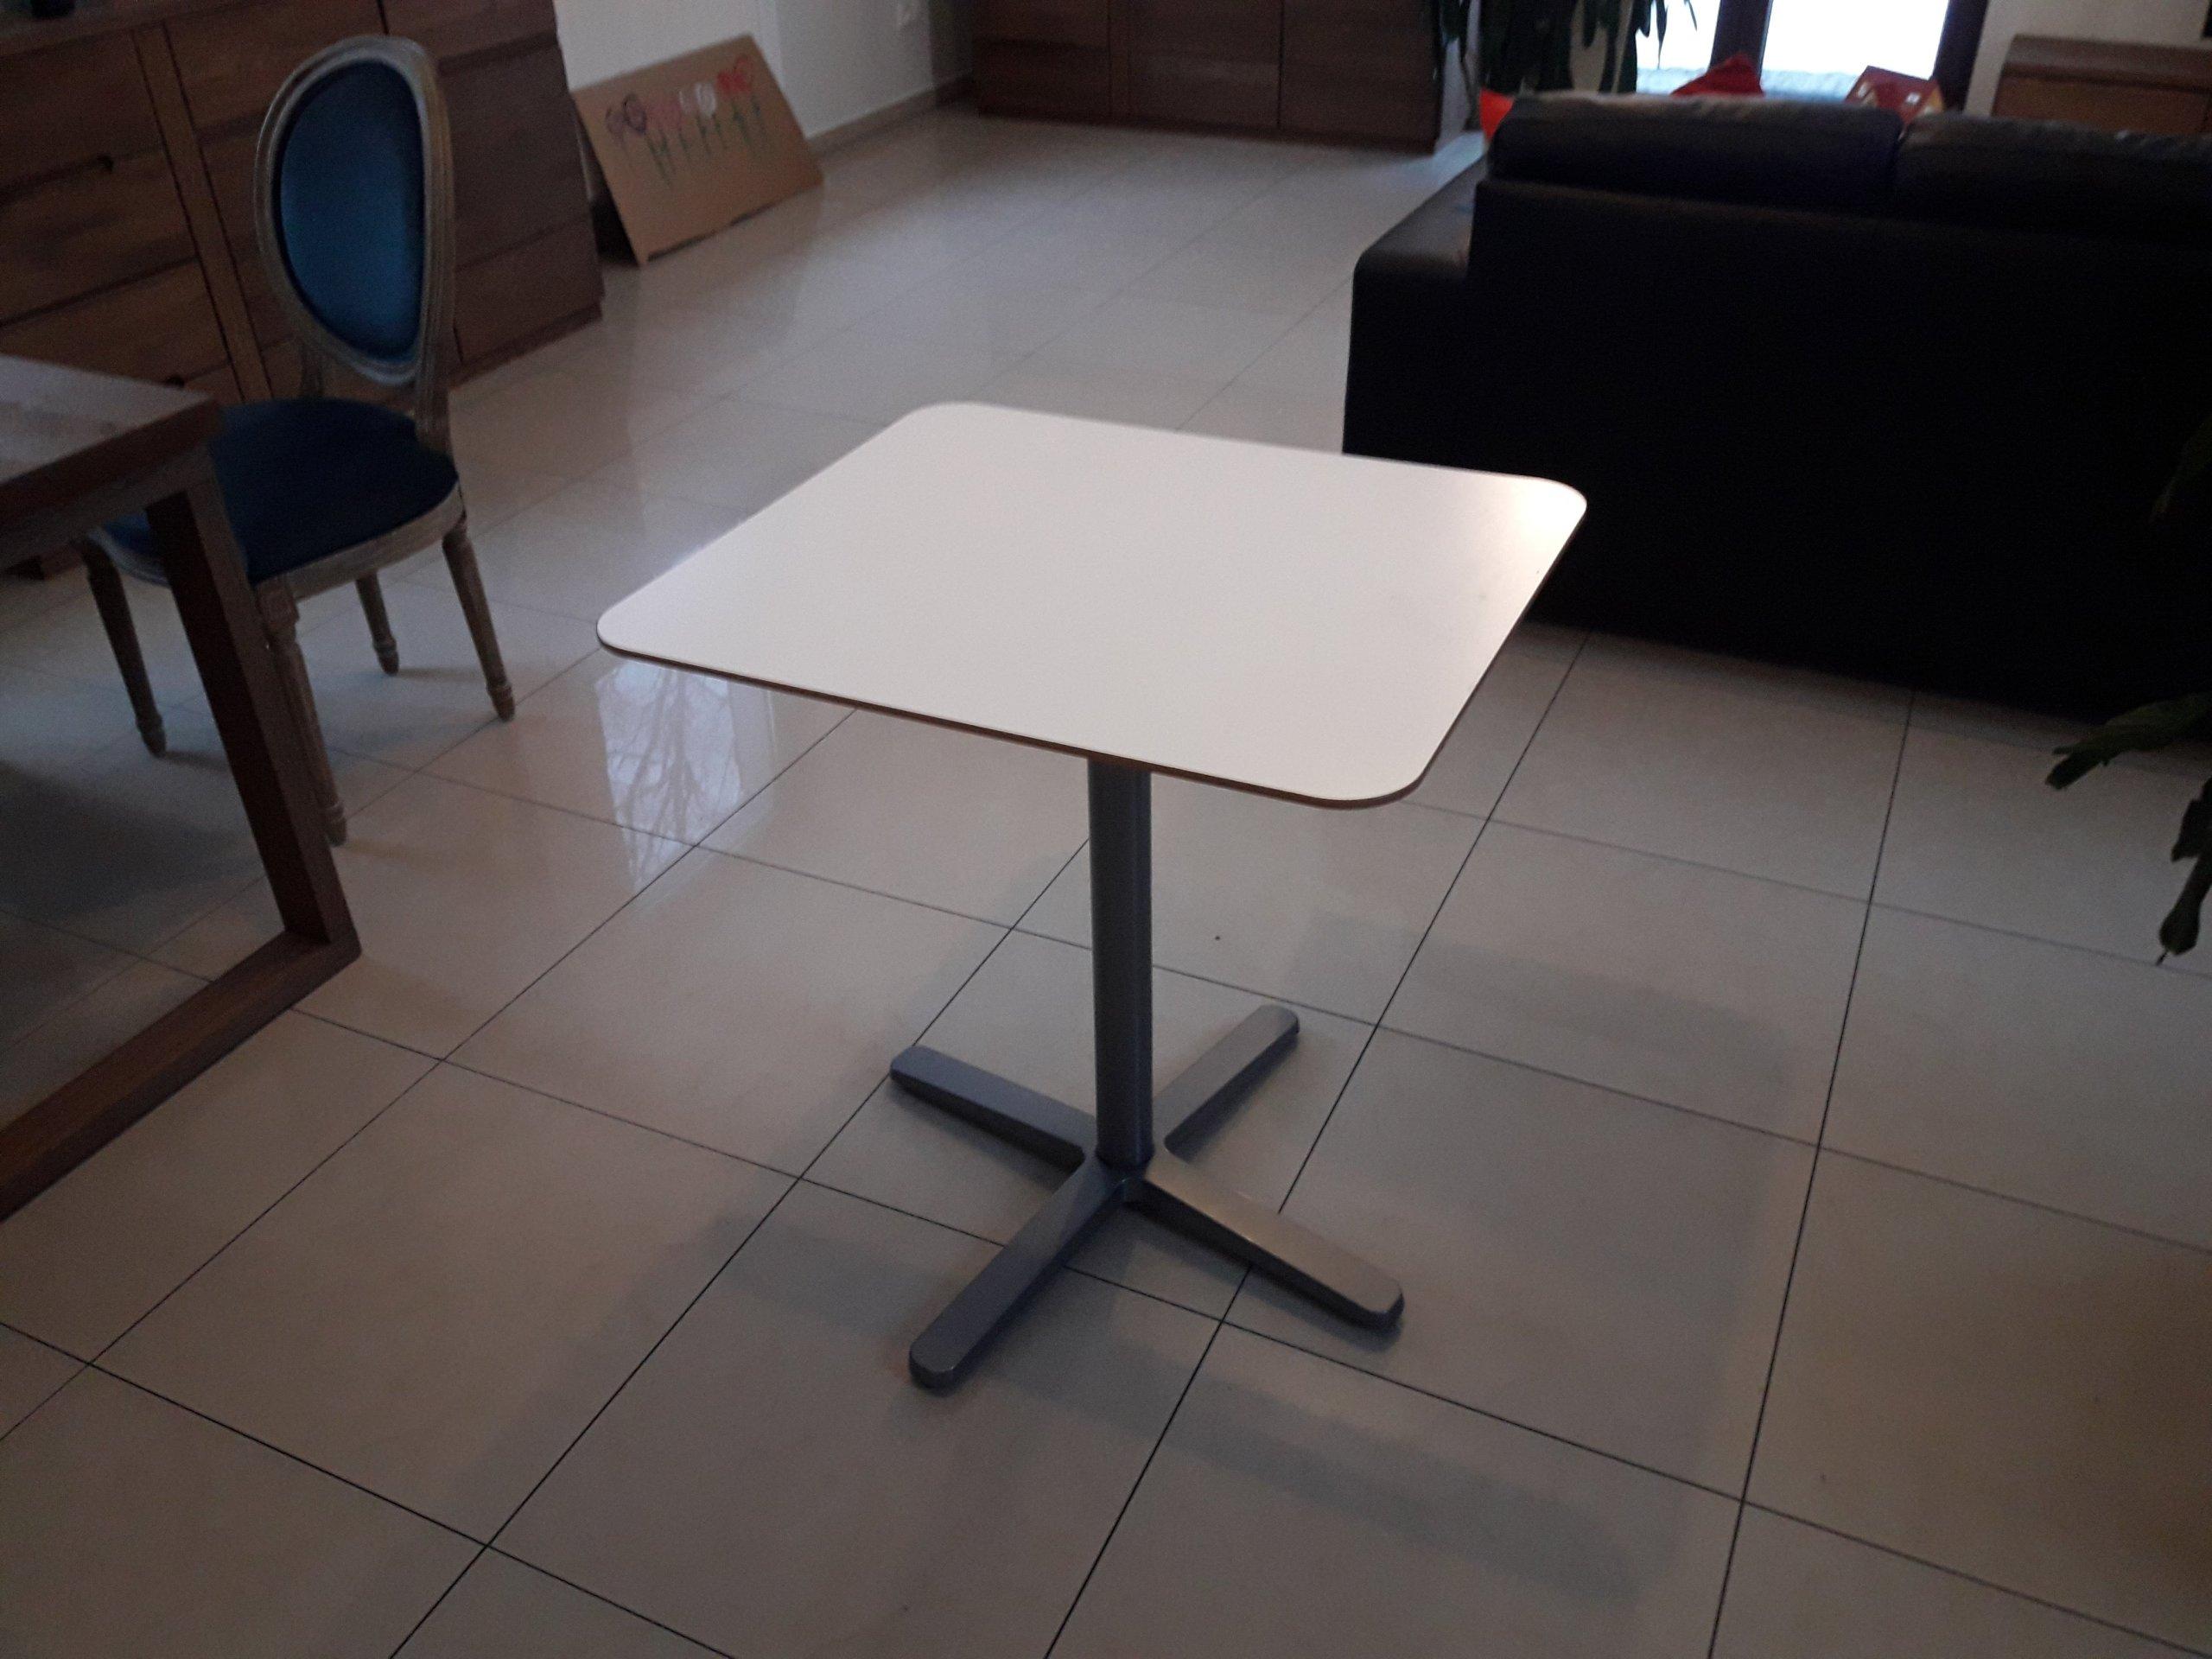 Stolik Kuchenny Kawiarniany Ikea Na 1 Noga Biały